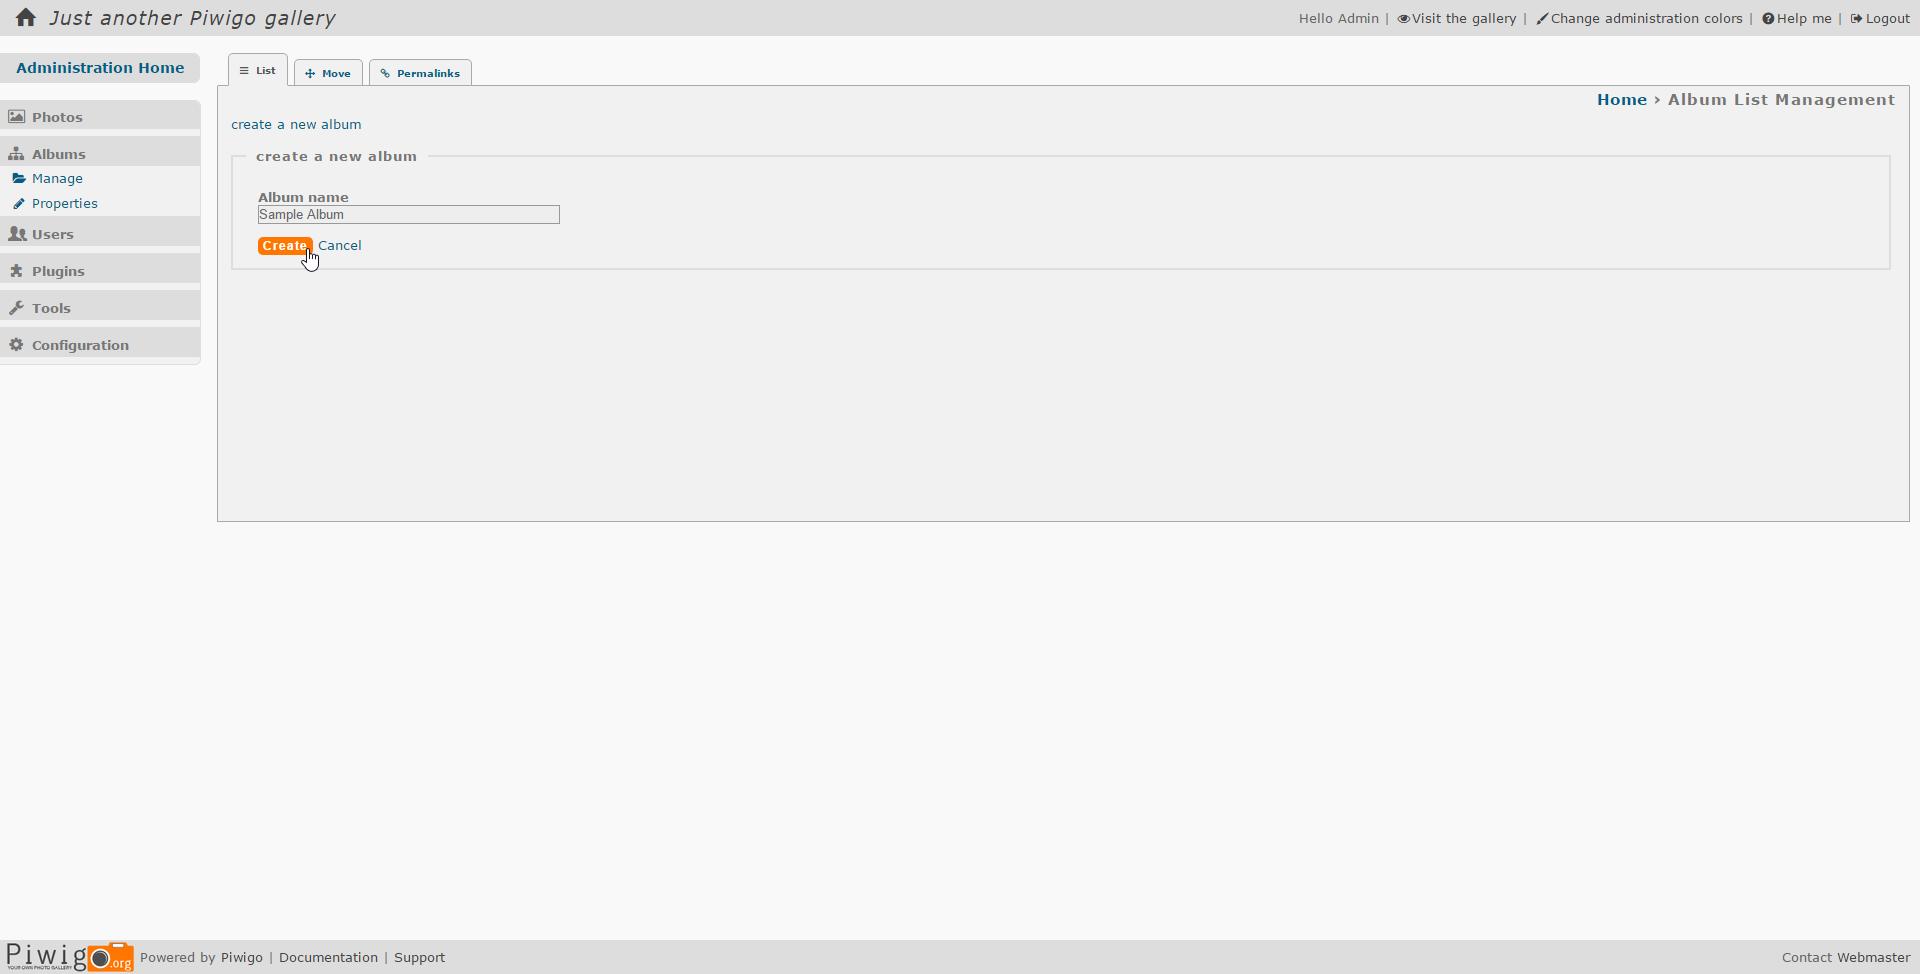 How to Install Piwigo Photo Gallery on Ubuntu 16 04 LTS